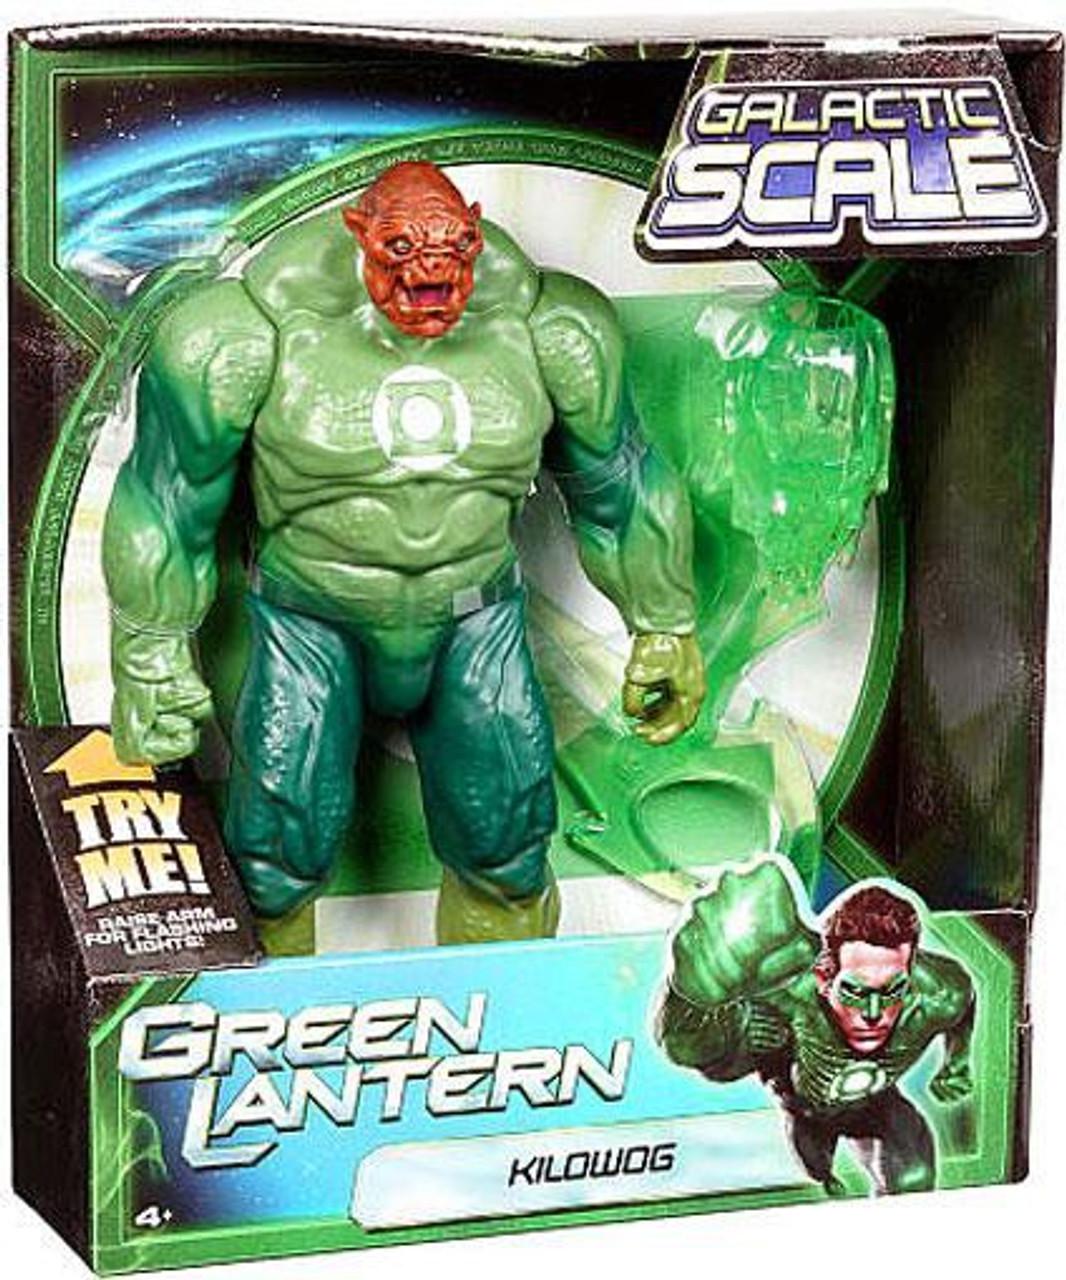 Green Lantern Galactic Scale Kilowog Action Figure